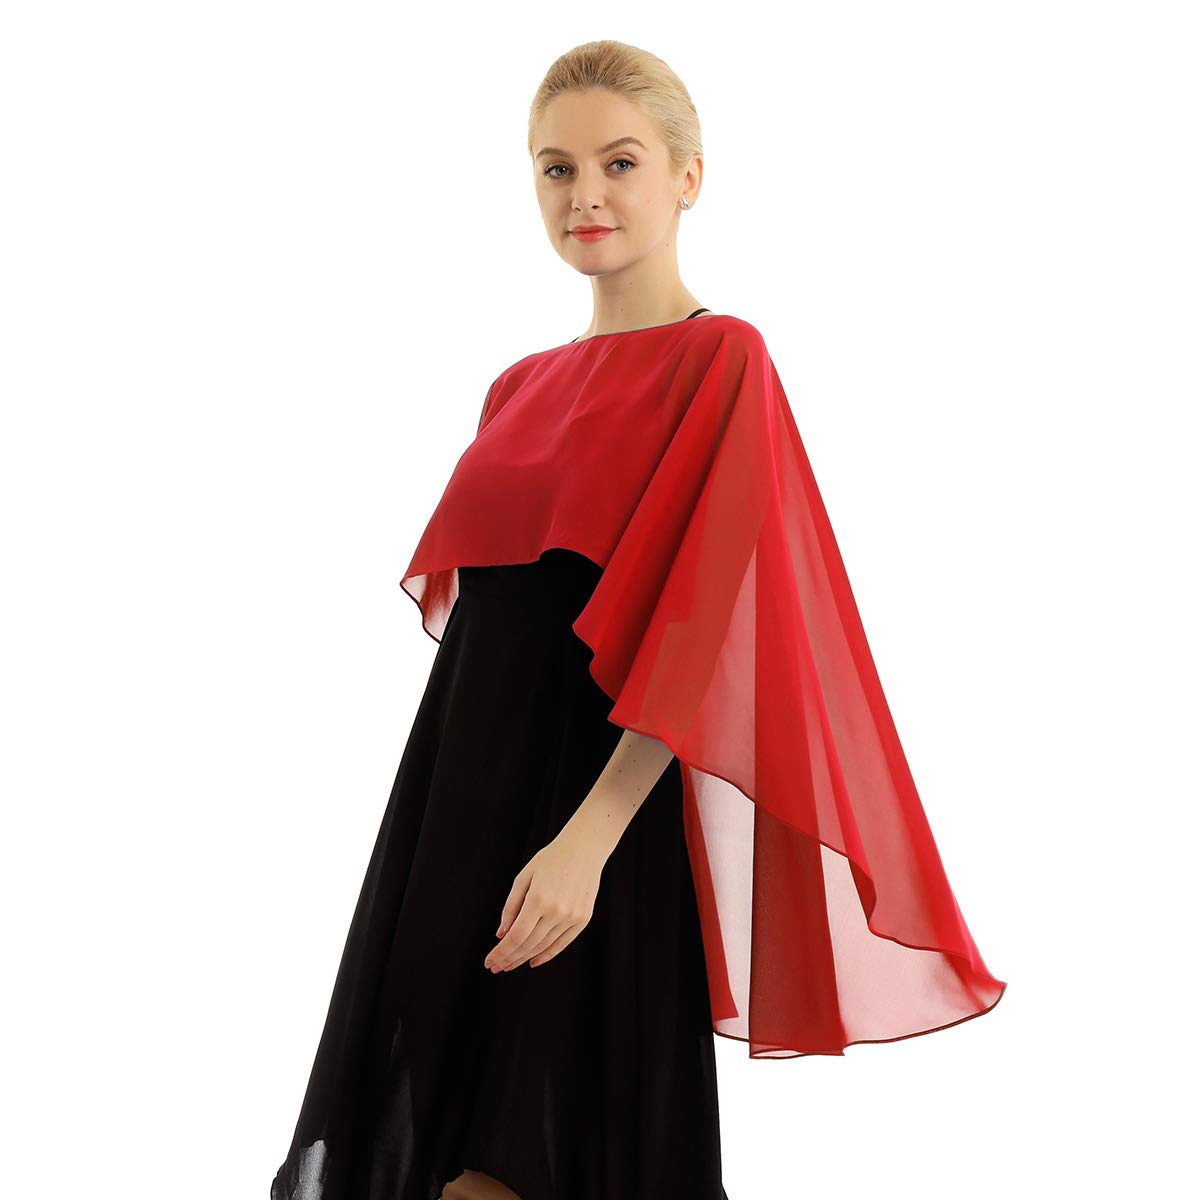 YiZYiF Damen Chiffon Bolero Jacke Elegant J/äckchen Cape Leichter Poncho Cardigan Tops Shrug Schal Umschlagtuch zum Brautkleid Abendkleid